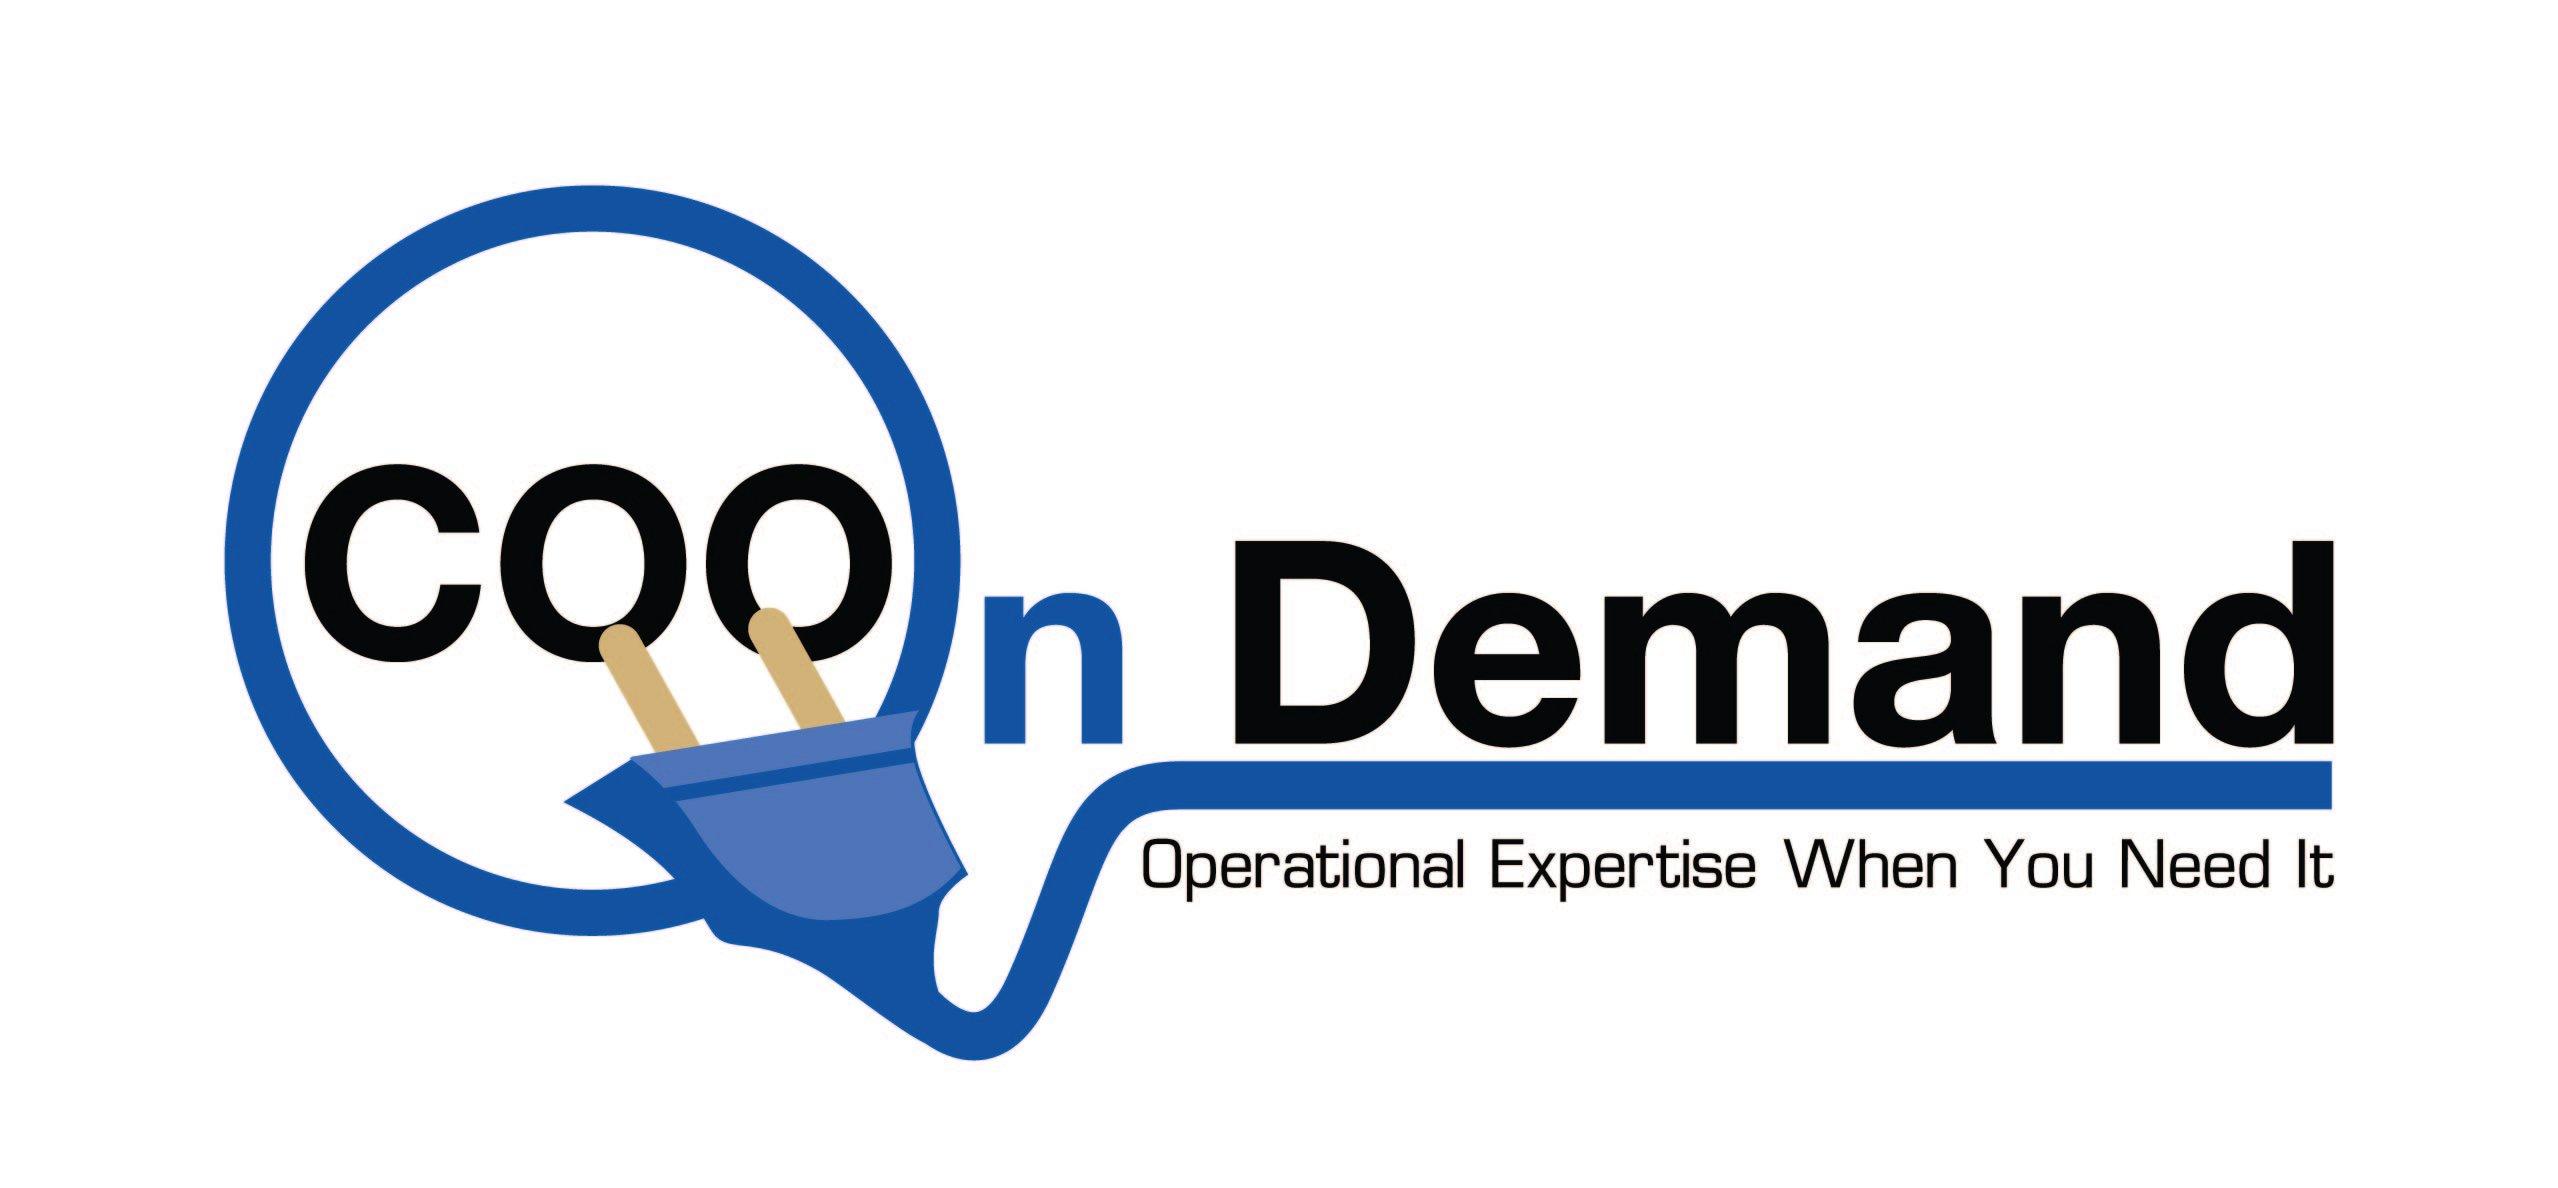 Diana Keyser is CEO of COO on Demand. Contact Diana at Diana@summitadvisorygroup.com